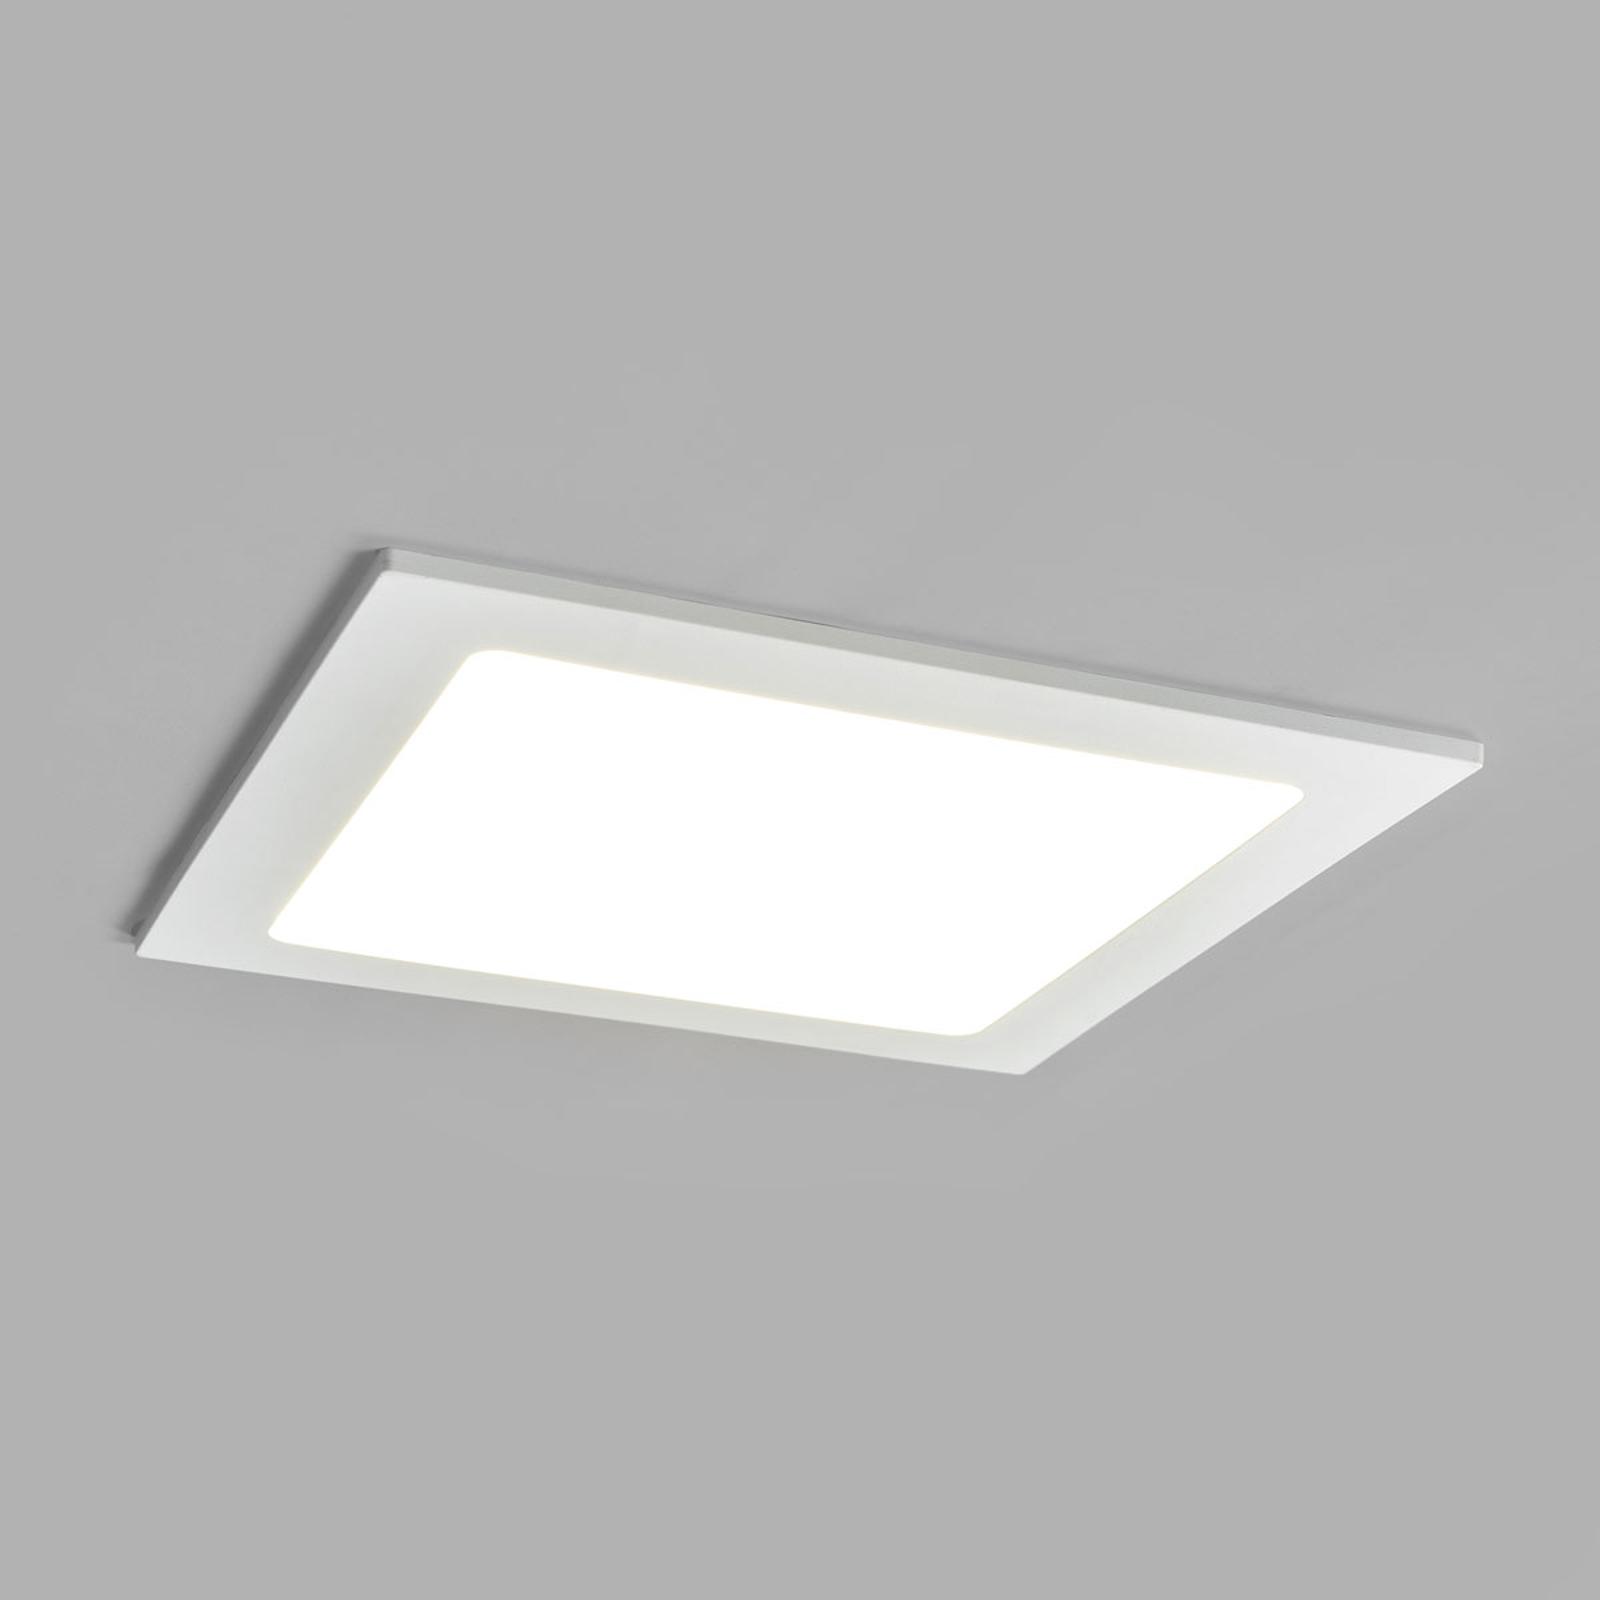 Spot LED Joki blanc 4000K angulaire 22cm